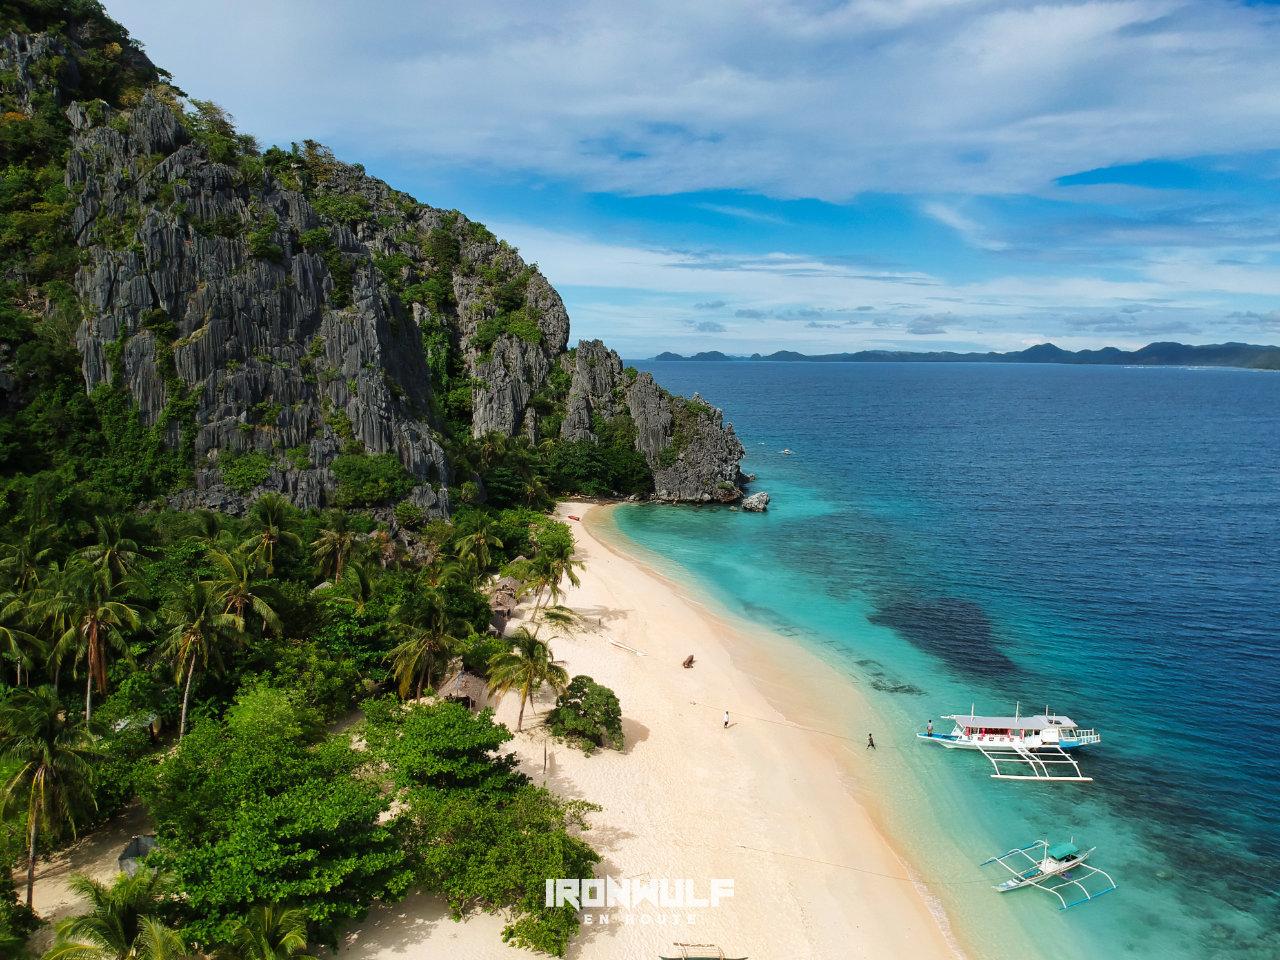 Malajon island also known as the Black Island